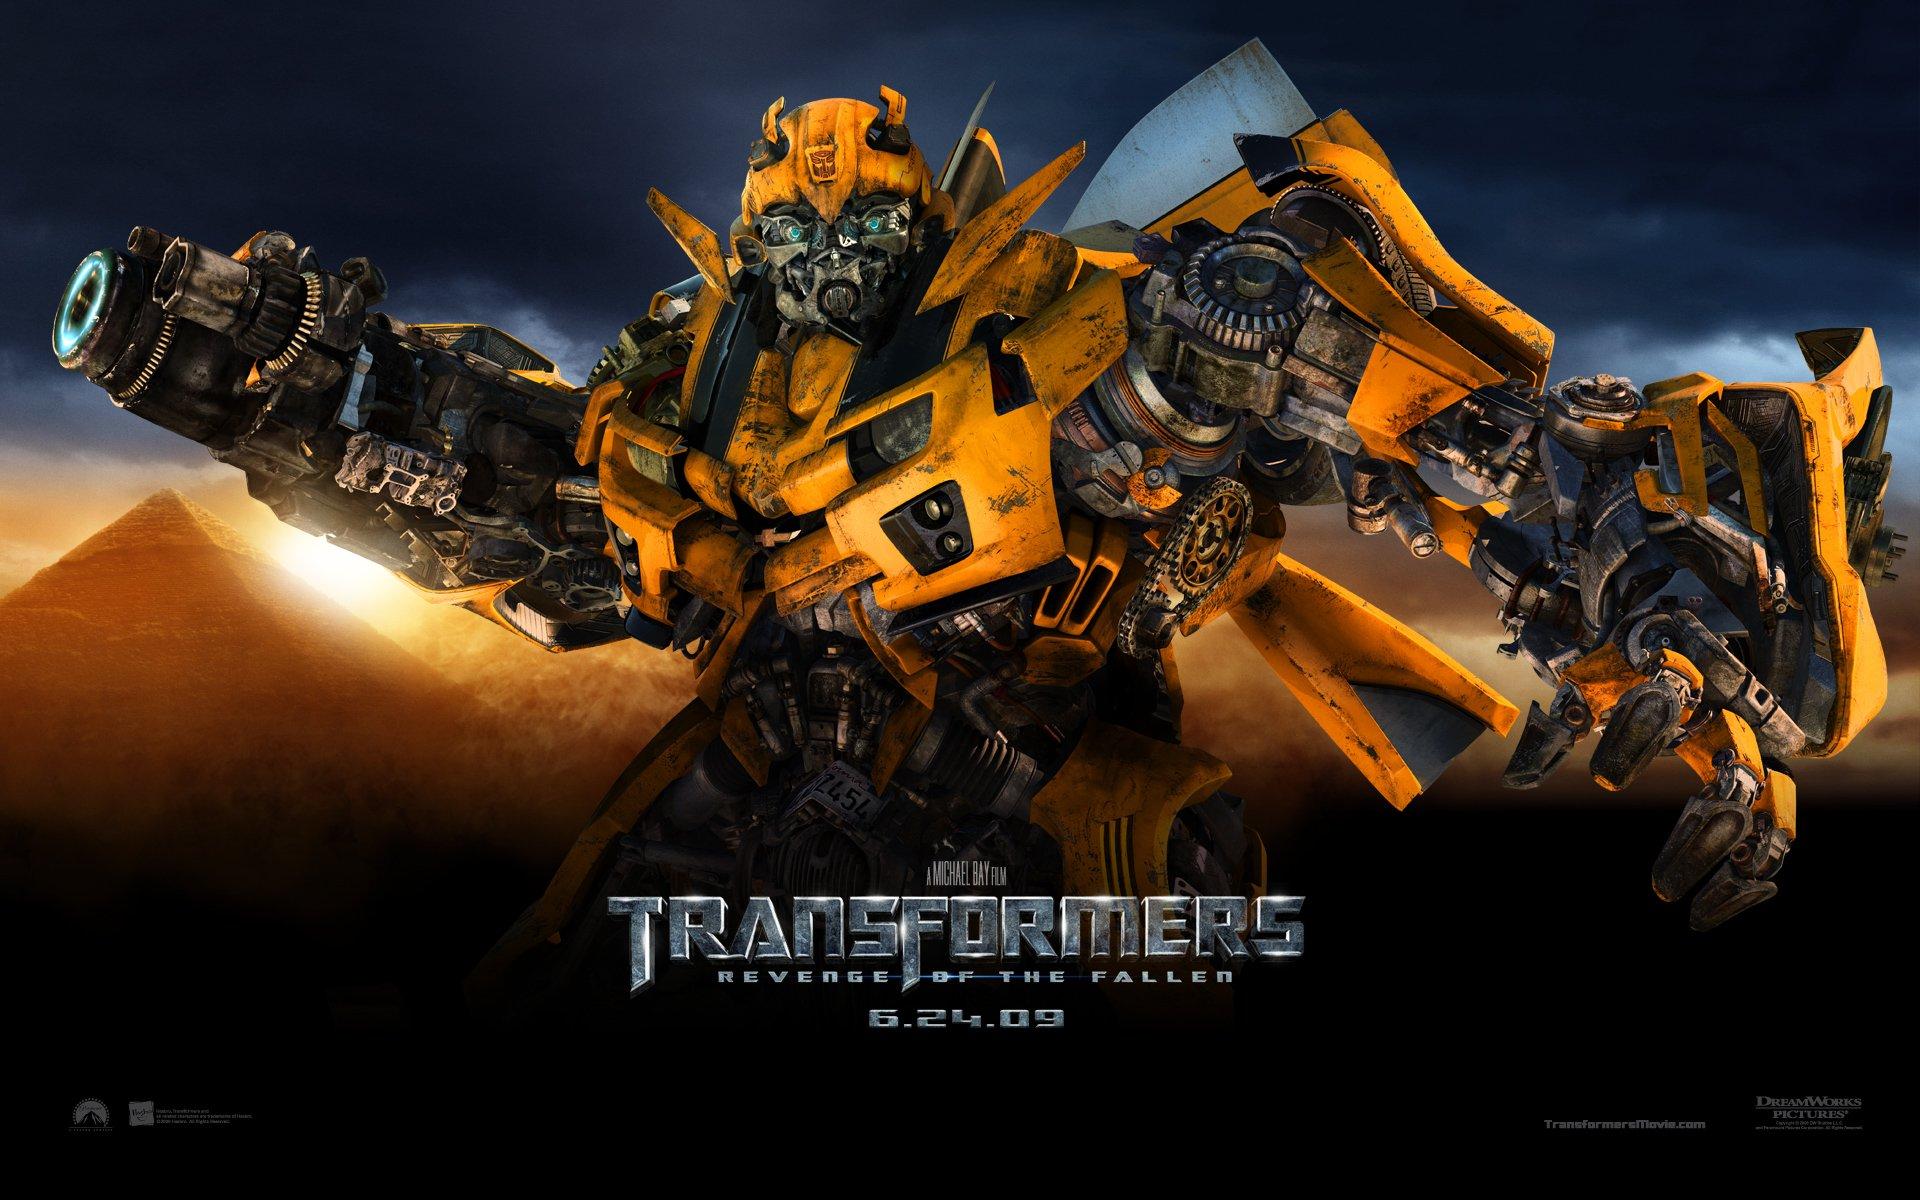 Movie - Transformers: Revenge of the Fallen  Movie Bumblebee (Transformers) Wallpaper